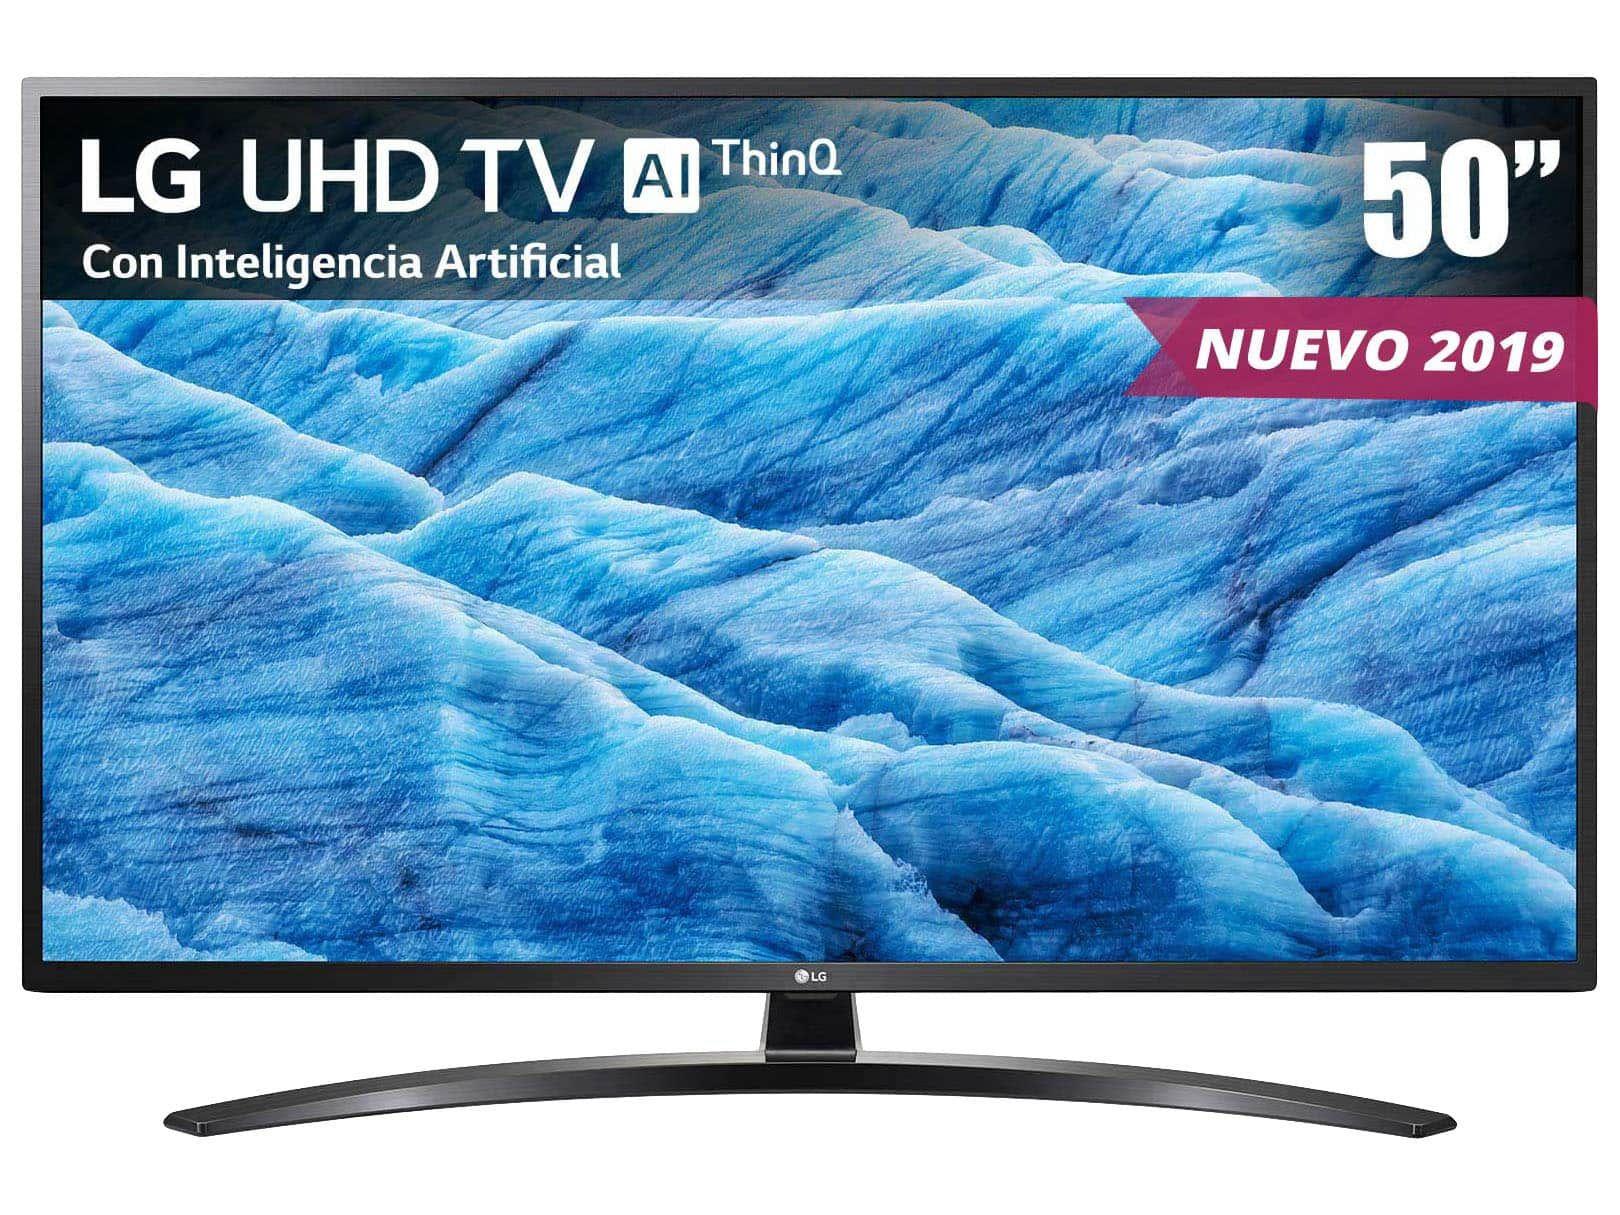 Liverpool Pantalla smart LG UHD TV AI ThinQ 4K 50 Pulgadas 50UM7400PUA